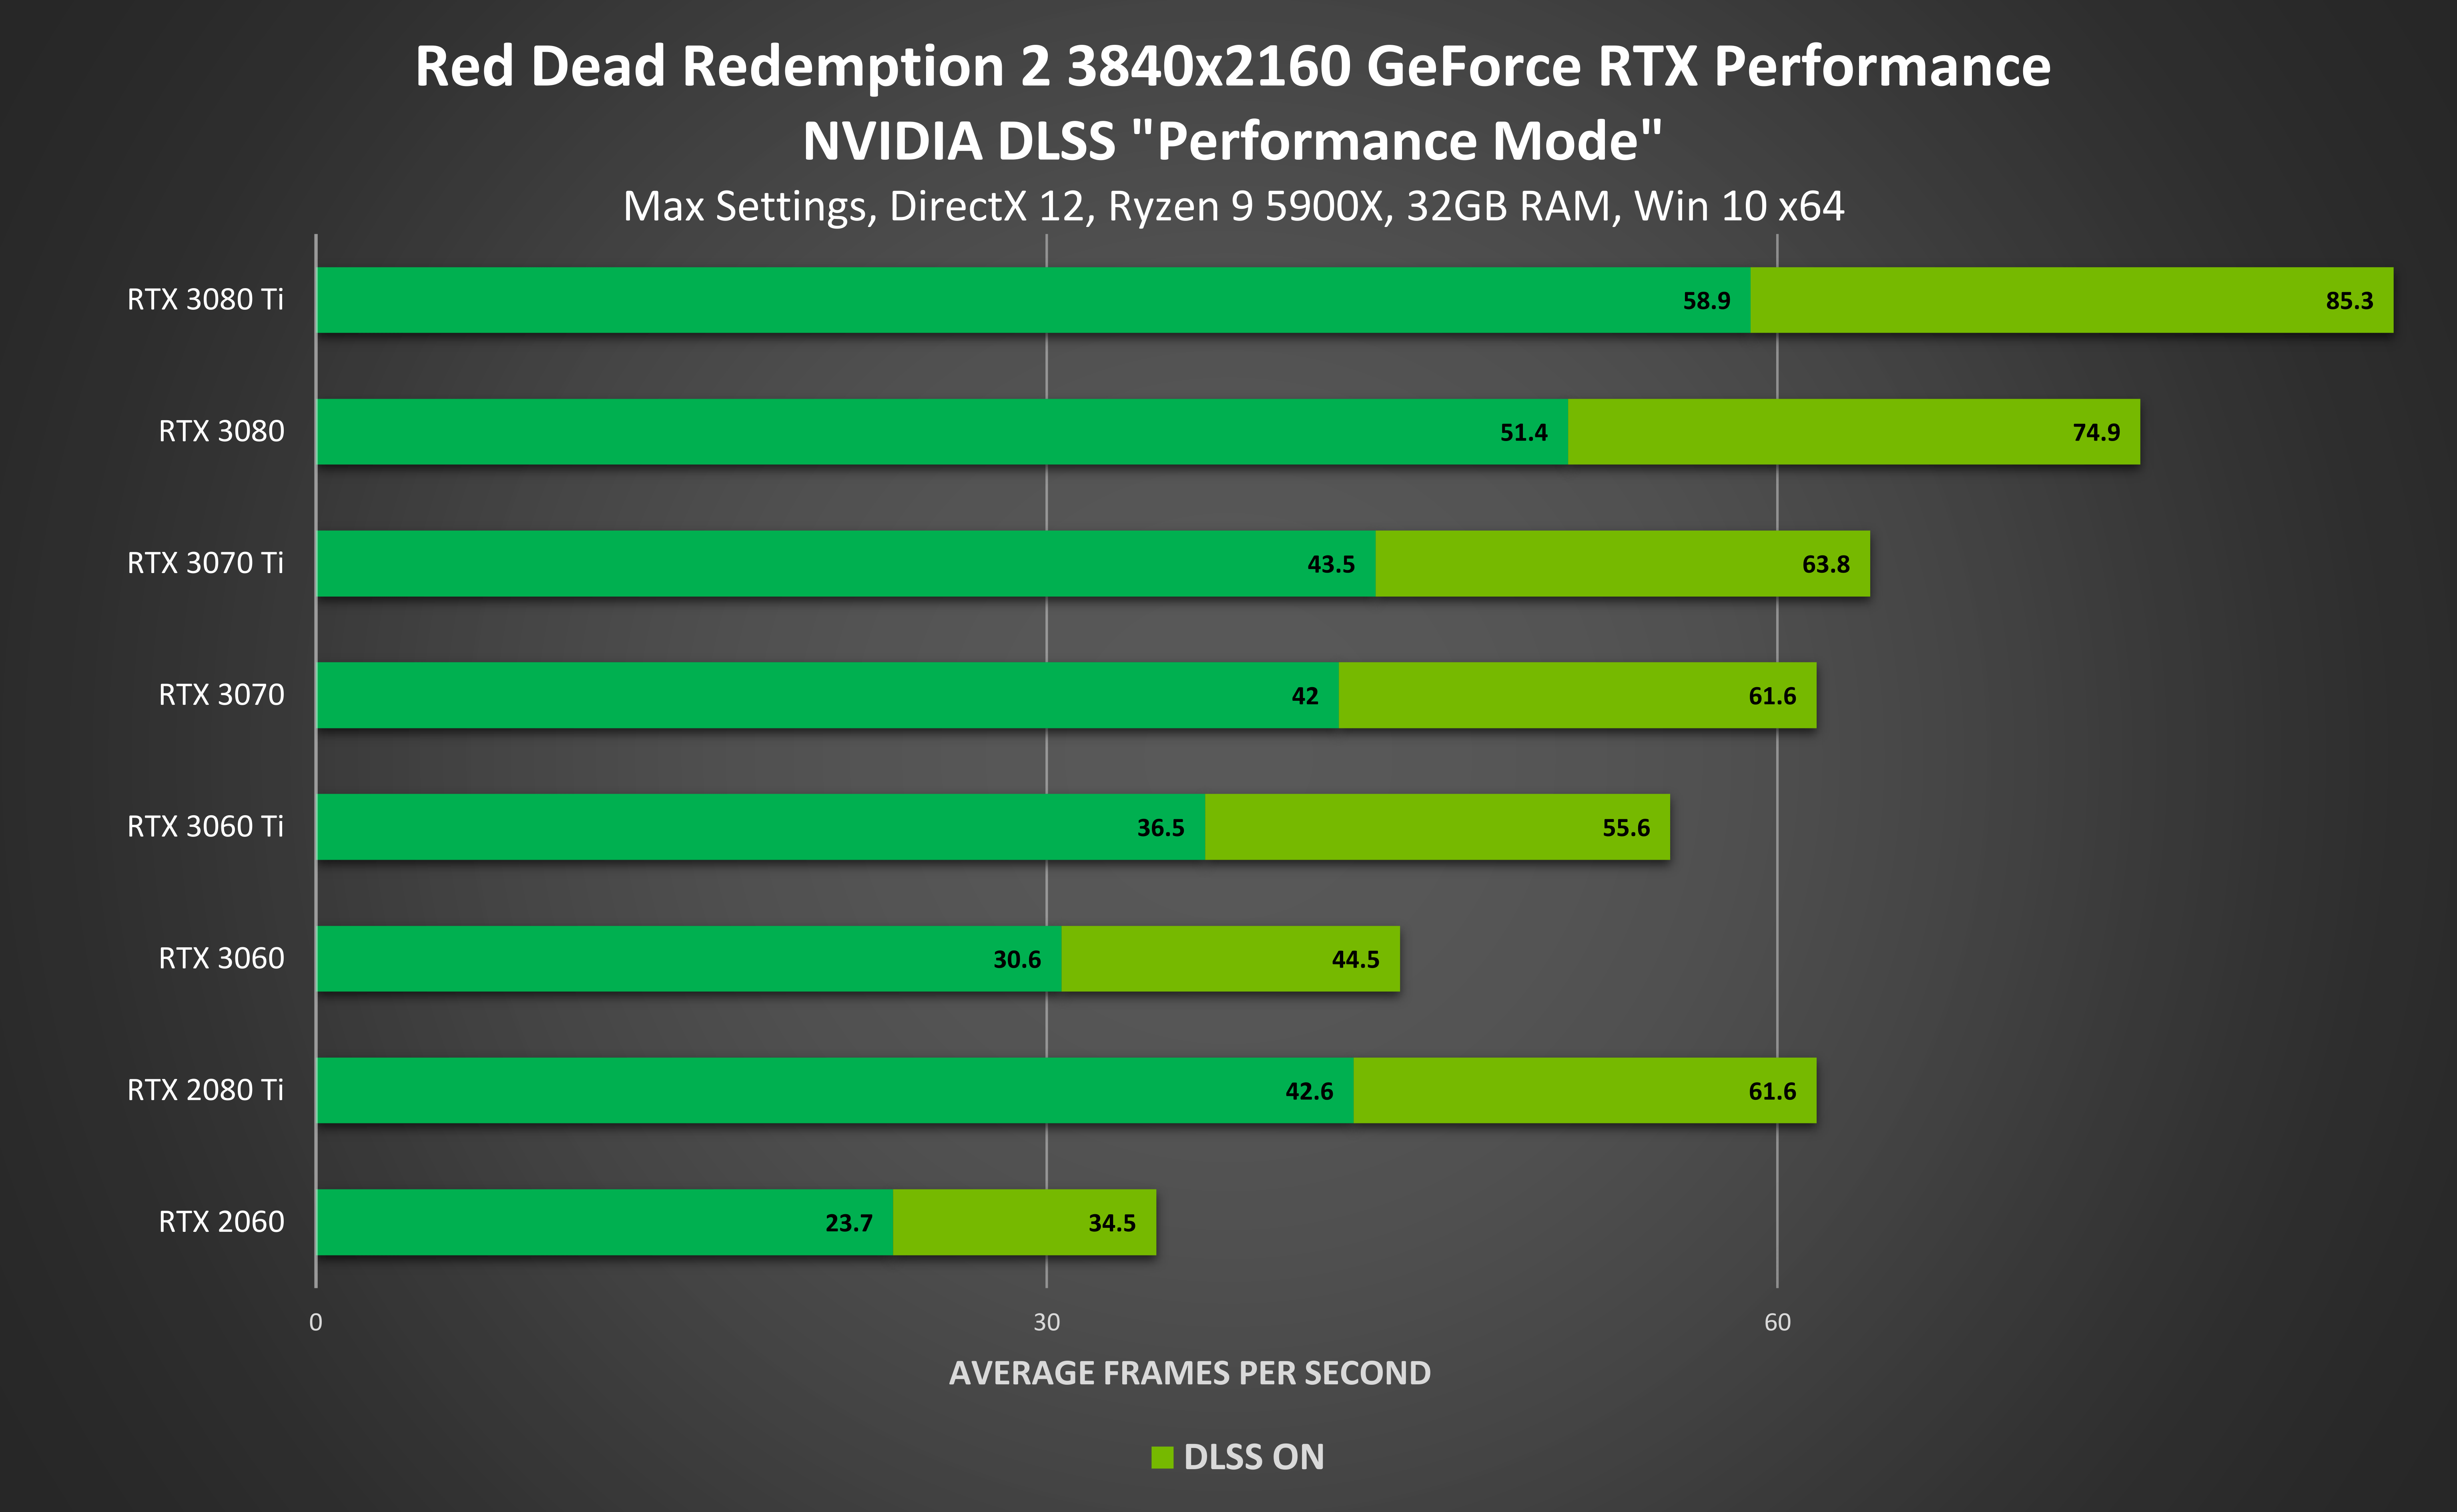 Red Dead Redemption 2 4k Geforce Rtx 3840x2160 Nvidia Dlss Directx12 Performance